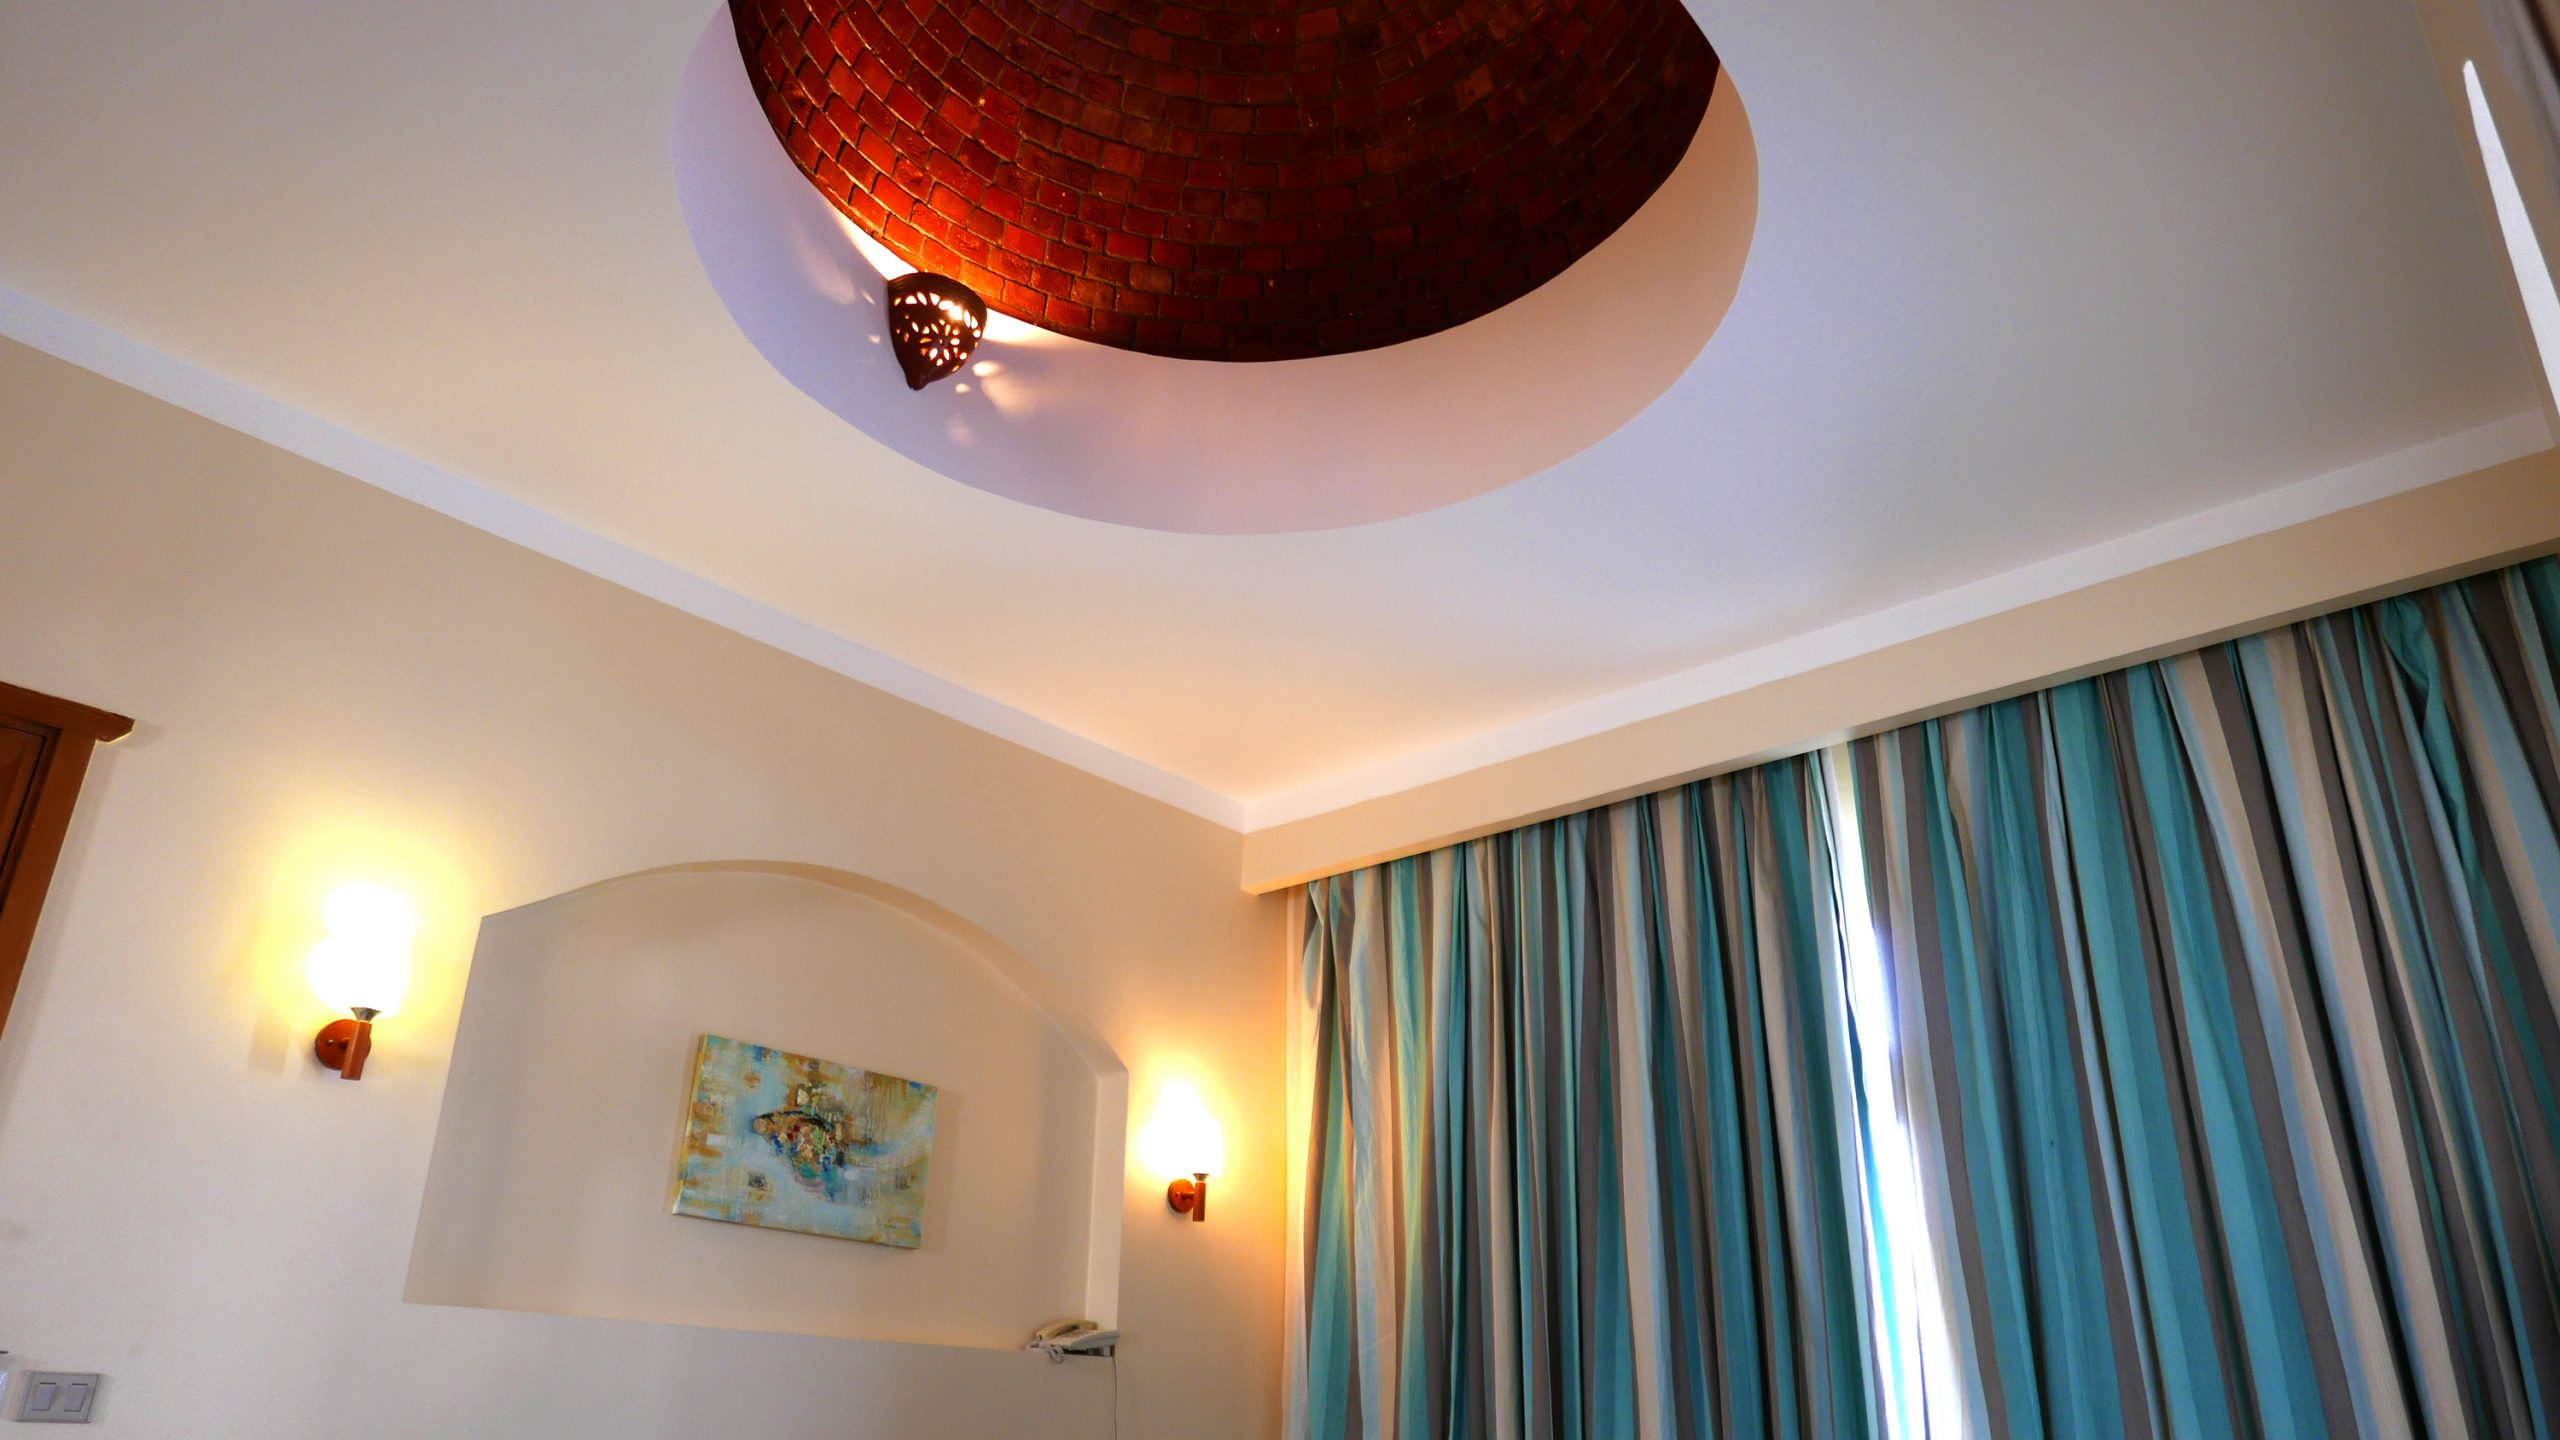 sheikh ali dahab resort egypt